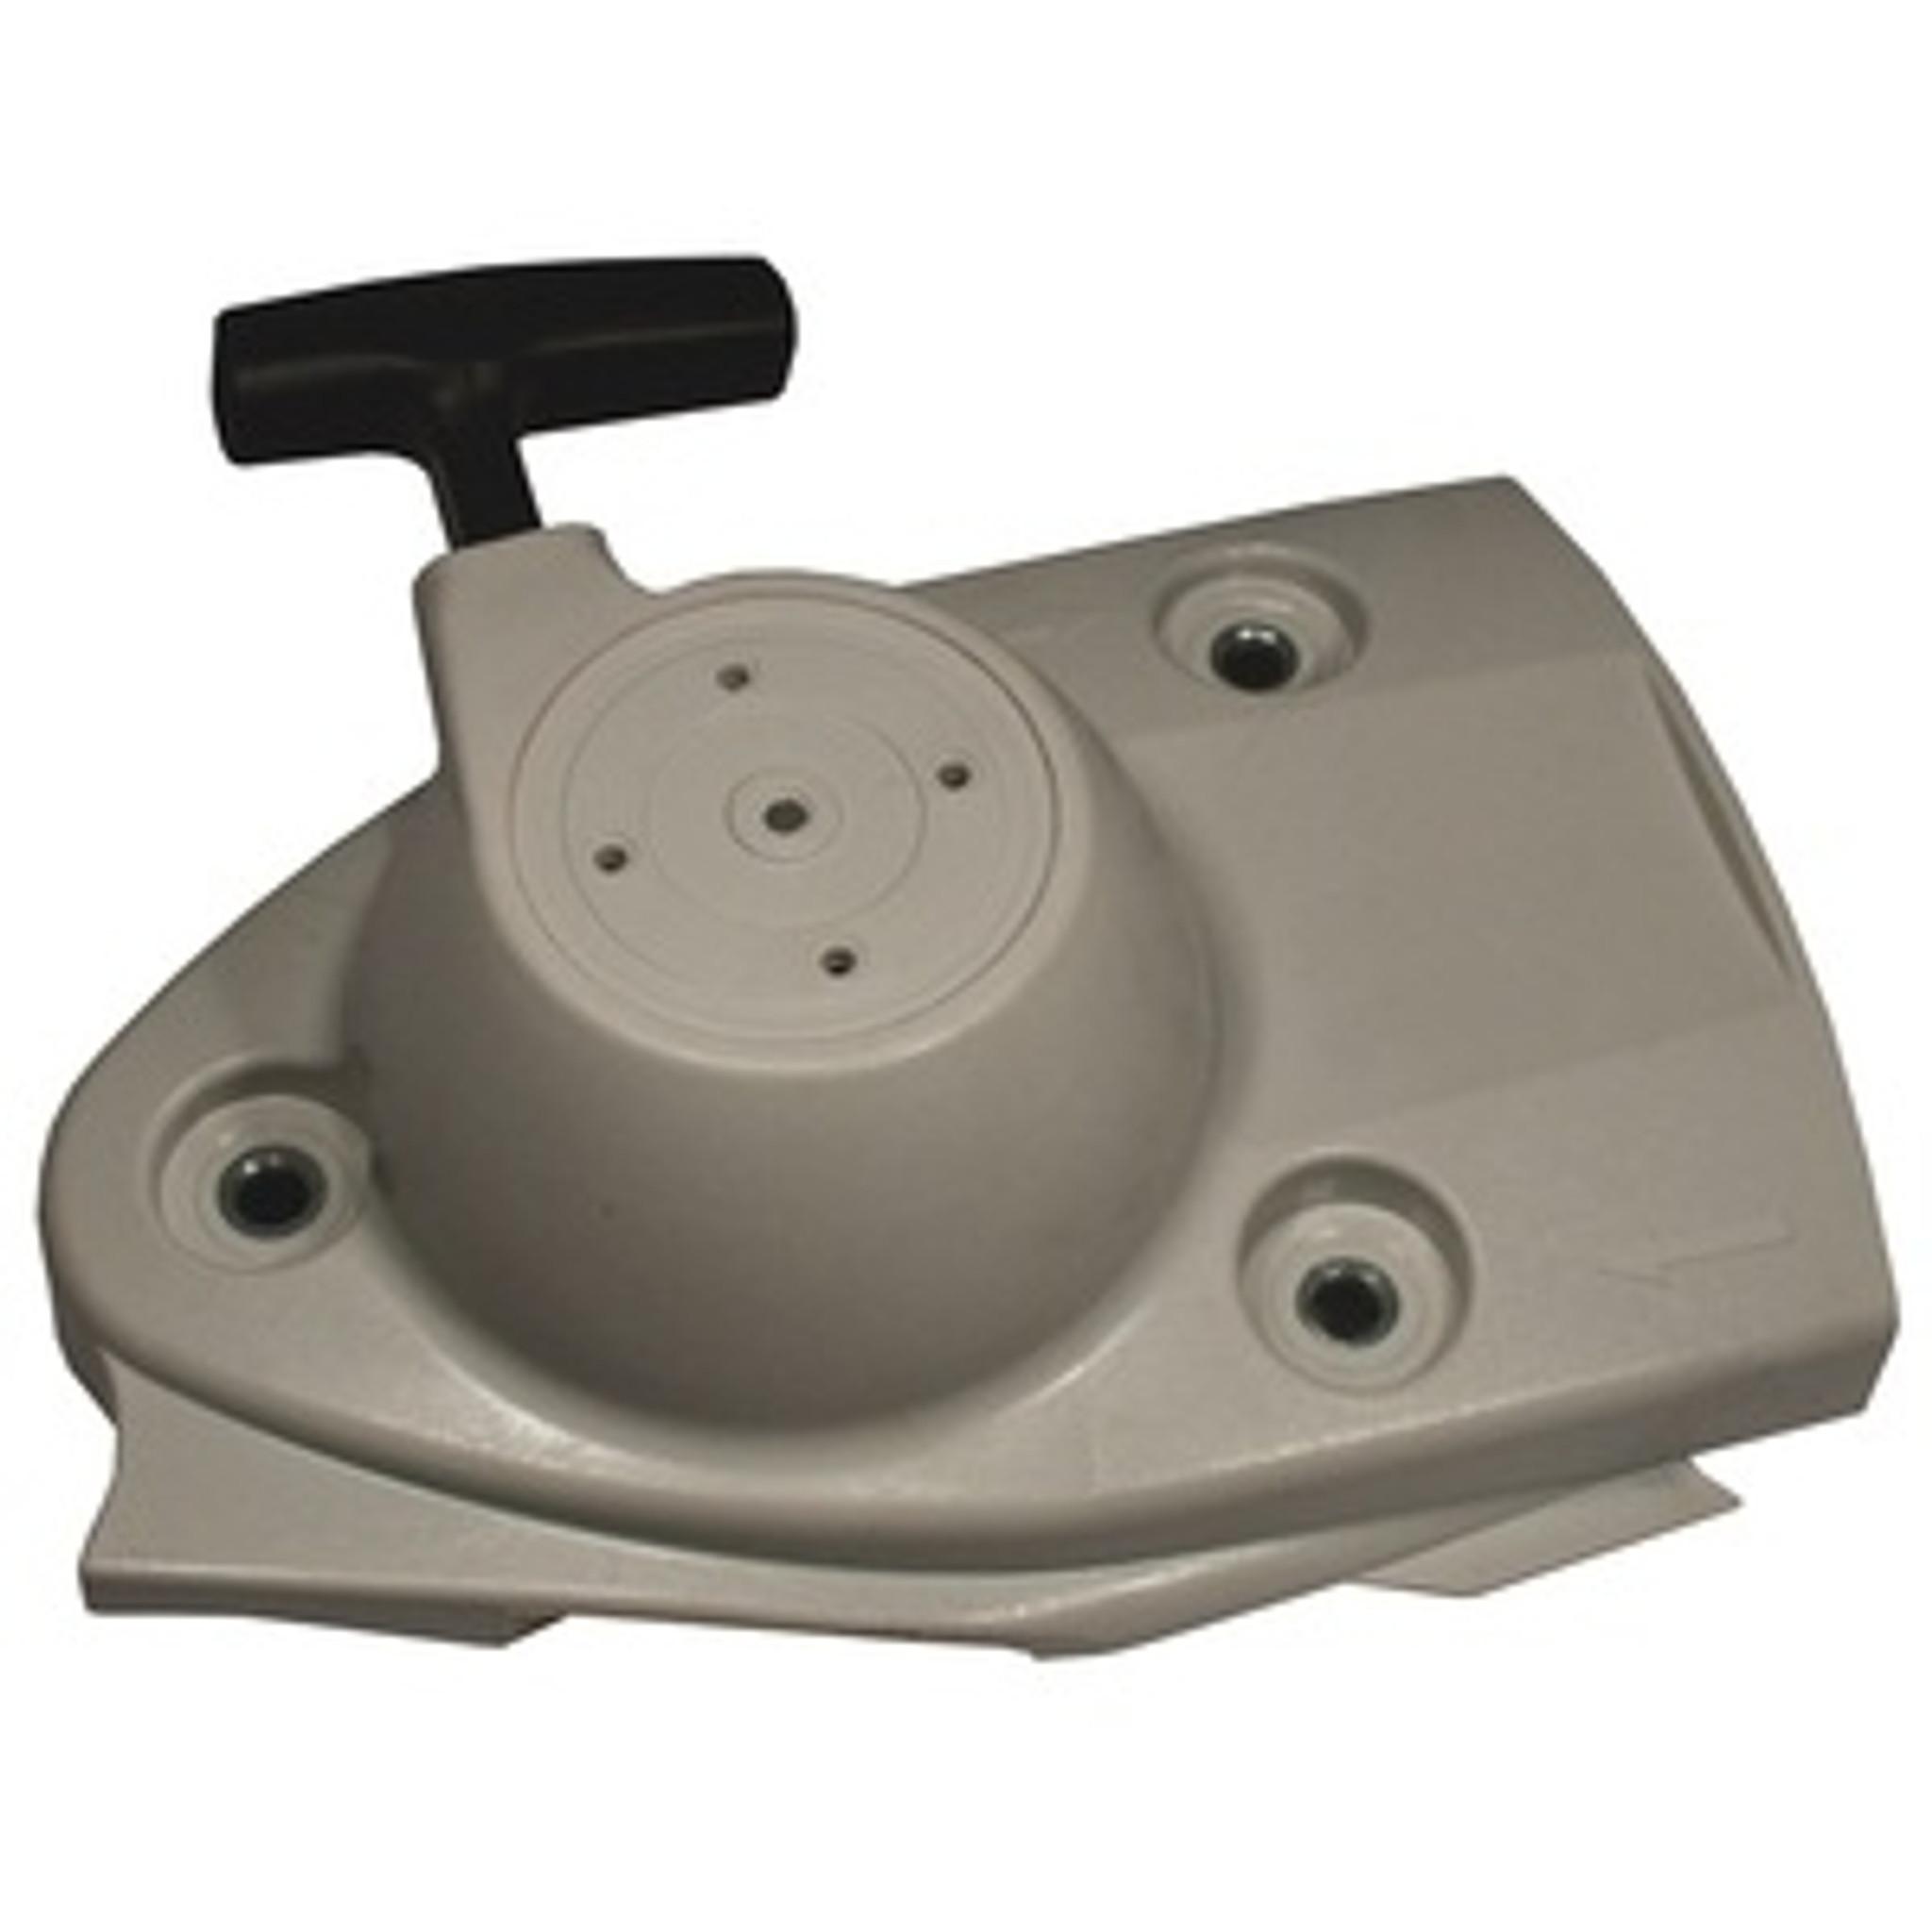 Recoil Starter For STIHL TS420 TS410 TS480I TS500I # 4238 190 0300 Cut-Off Saws